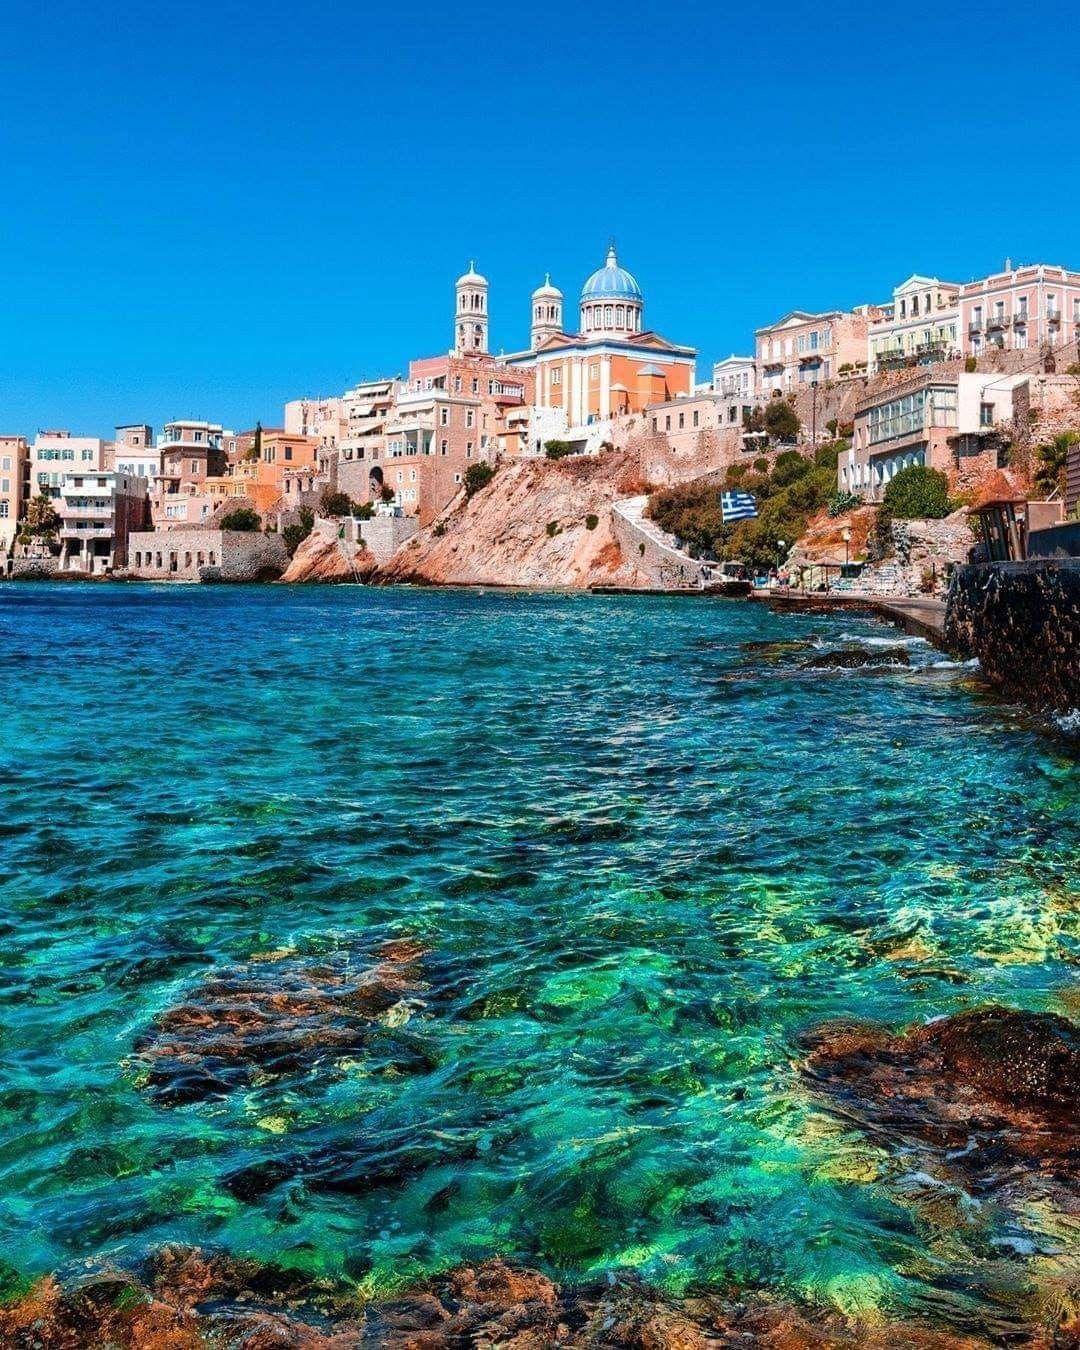 Pin By Elena C On Ellada Di Elena Cannata Travel Around The World Countries To Visit Greece Islands